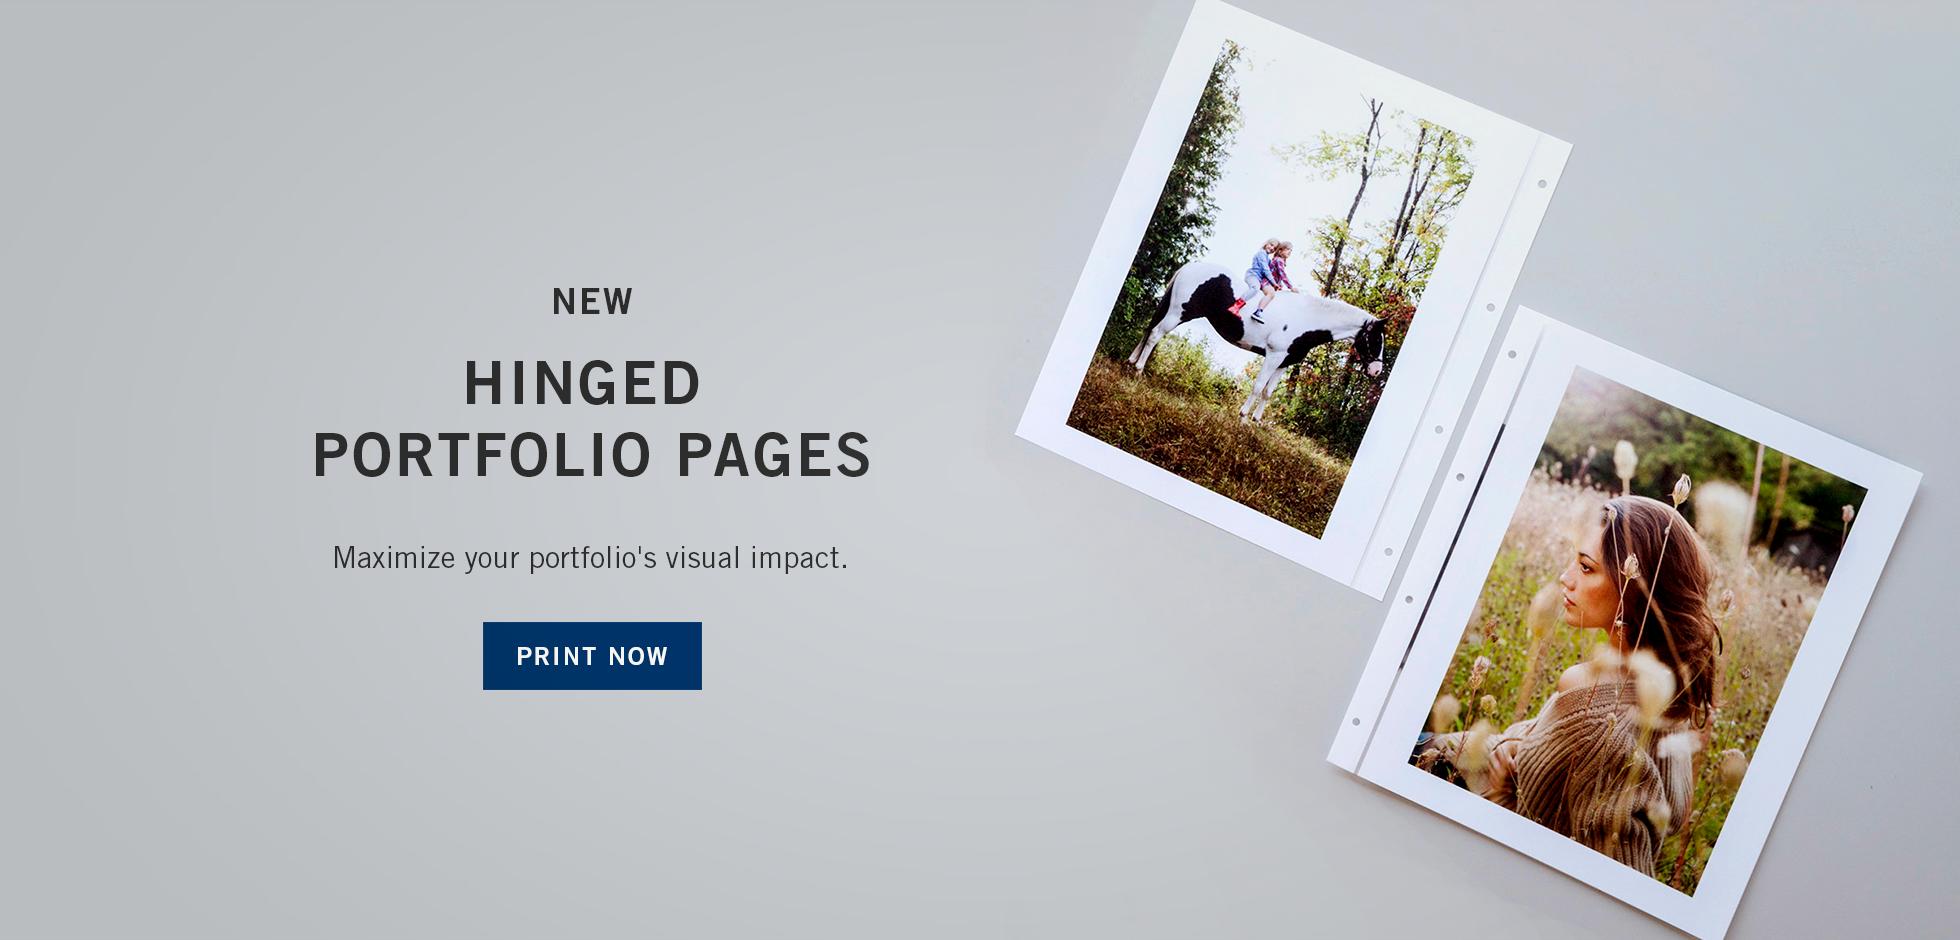 Hinged Portfolio Pages